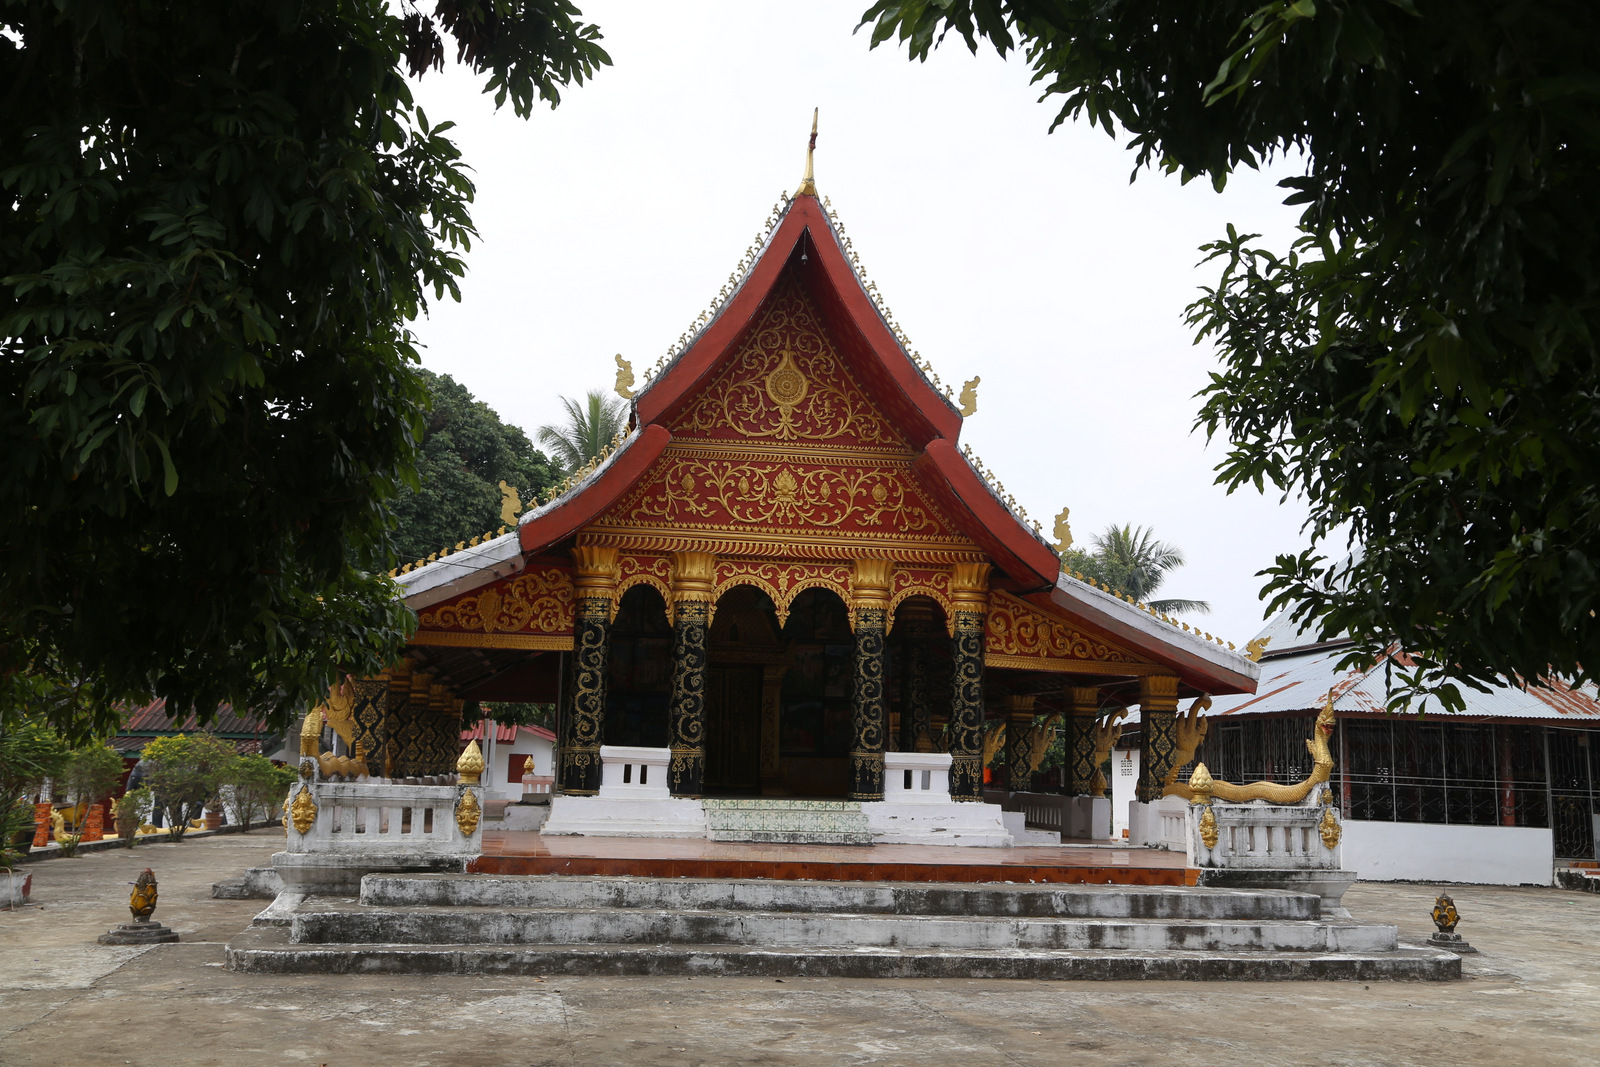 Banou temple